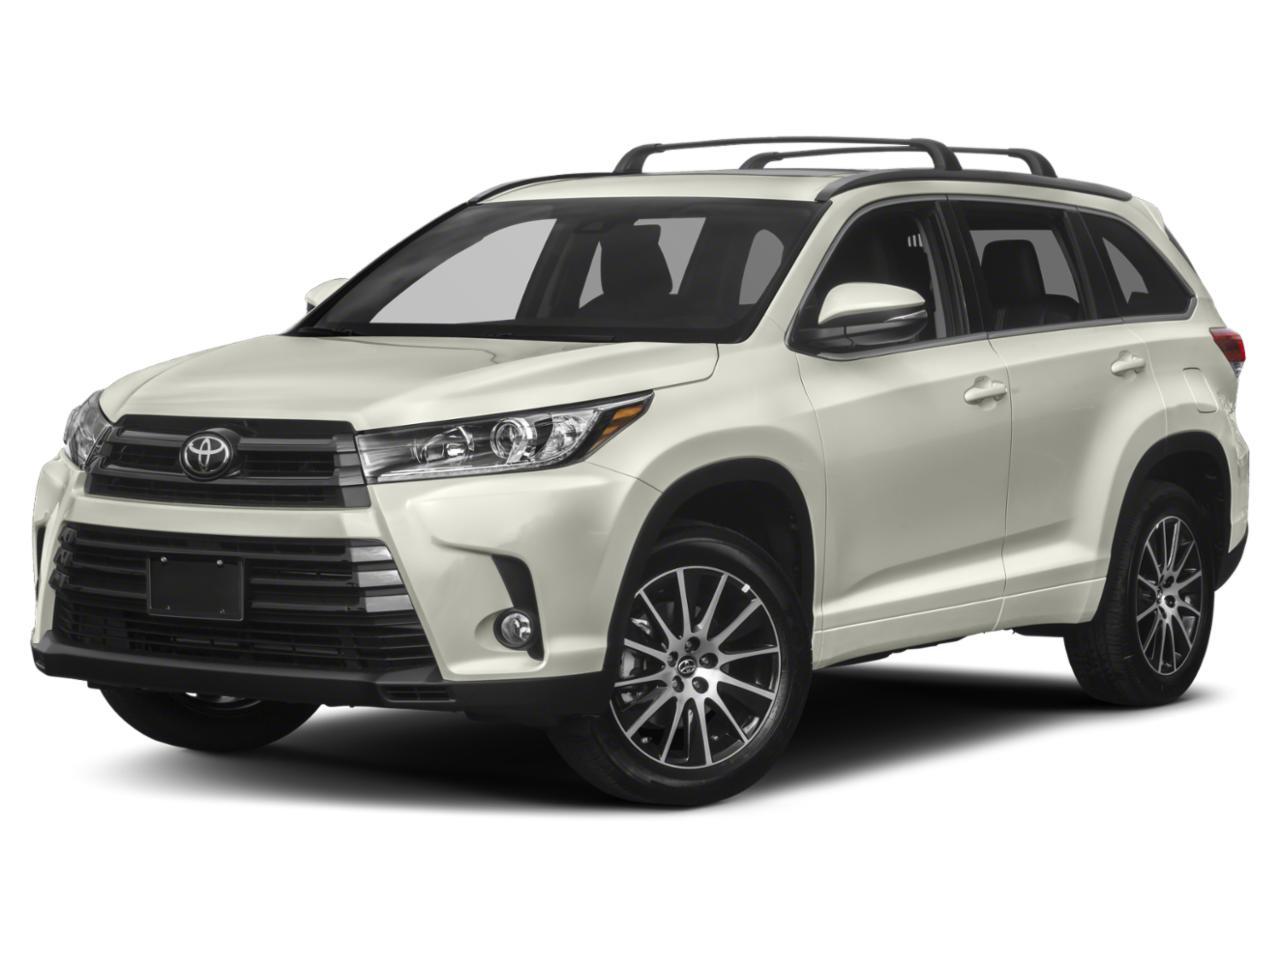 2019 Toyota Highlander Vehicle Photo in NEENAH, WI 54956-2243